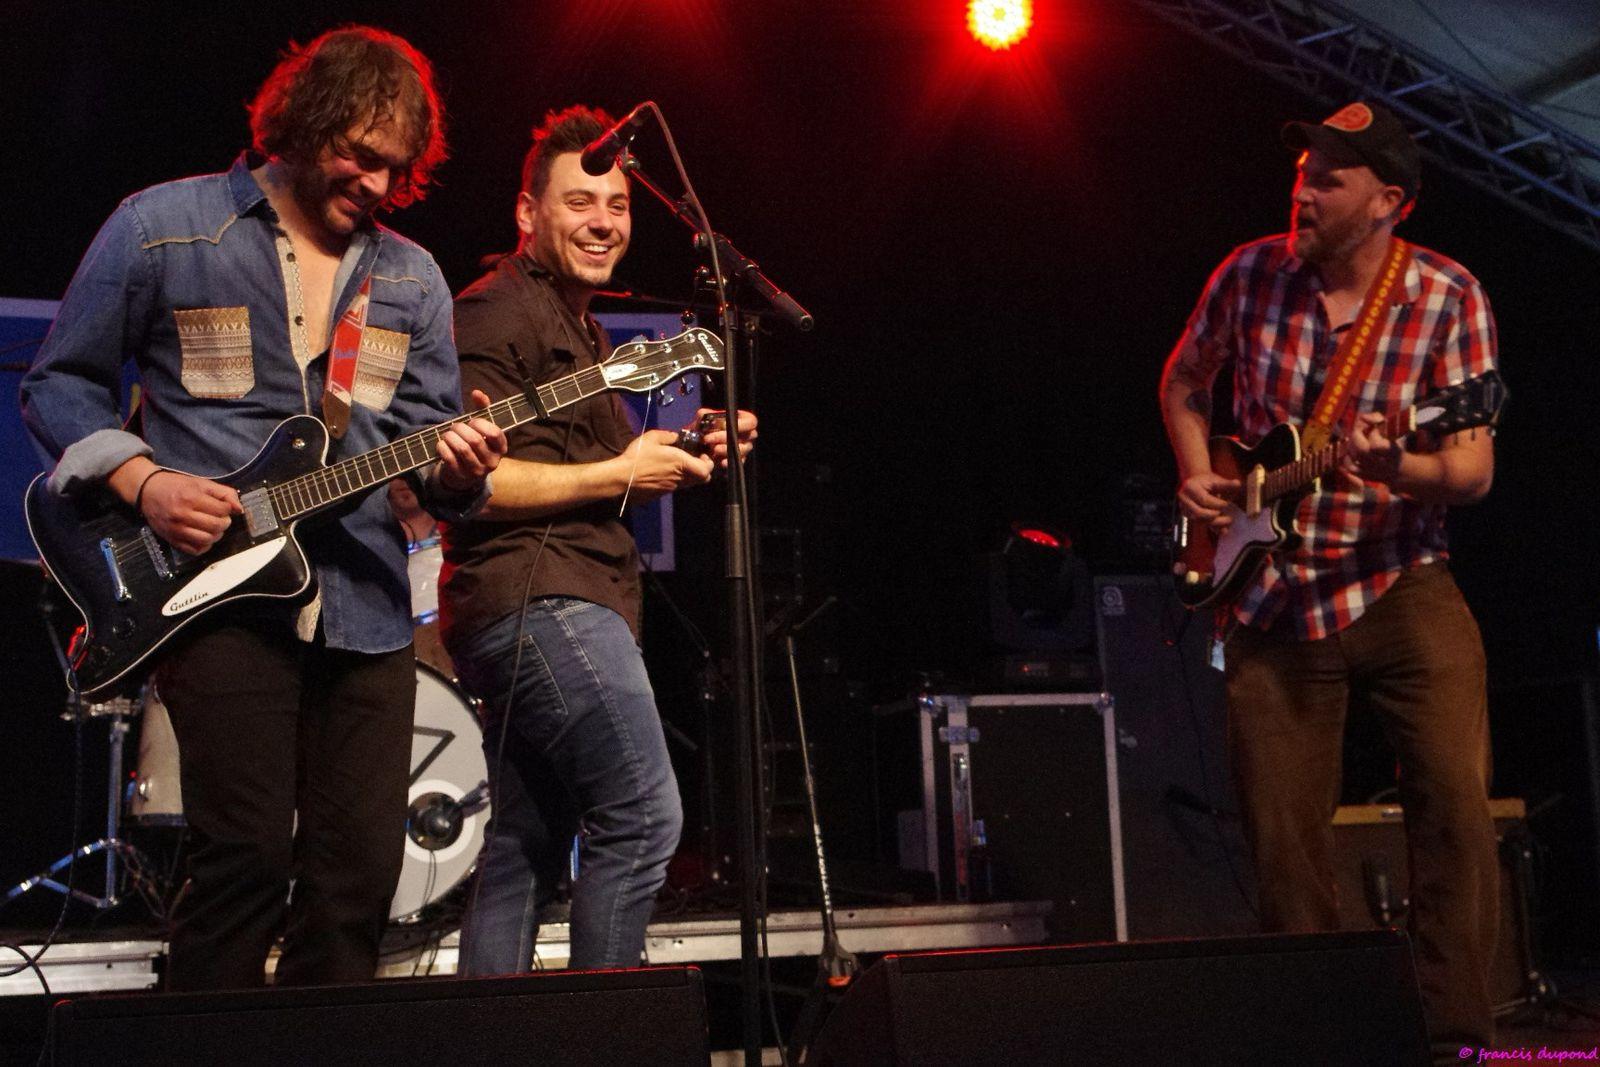 Boogie Beasts - Nuit du Blues 2013 - Charleroi (B)